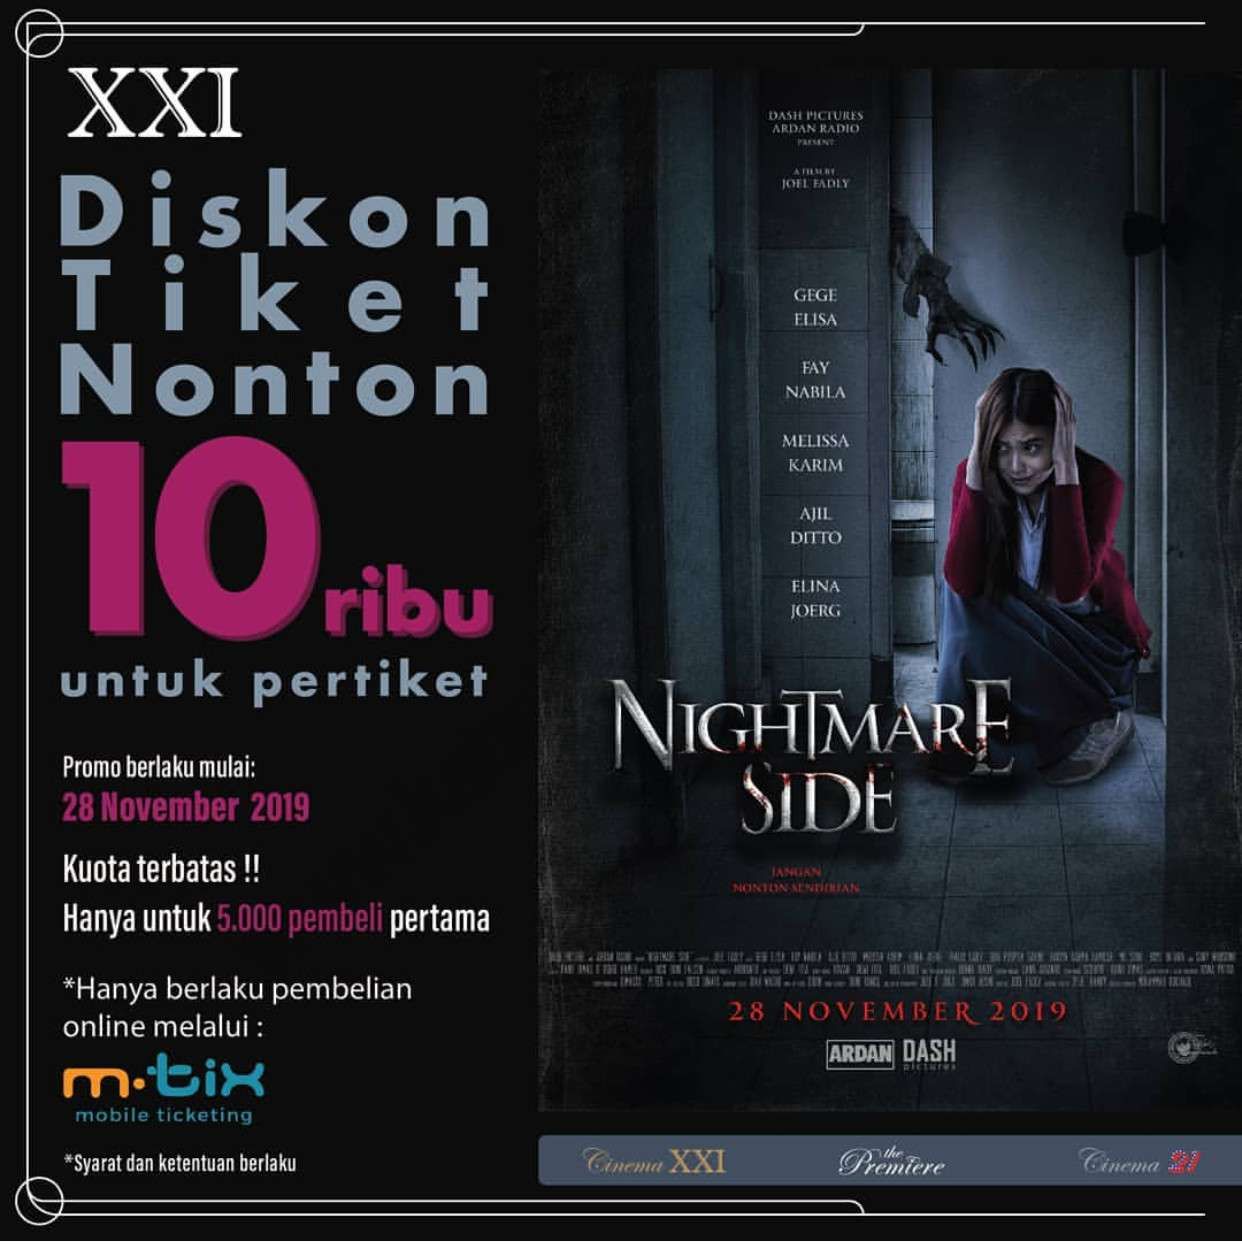 XXI Promo Diskon Rp. 10.000 untuk film Nightmare Side